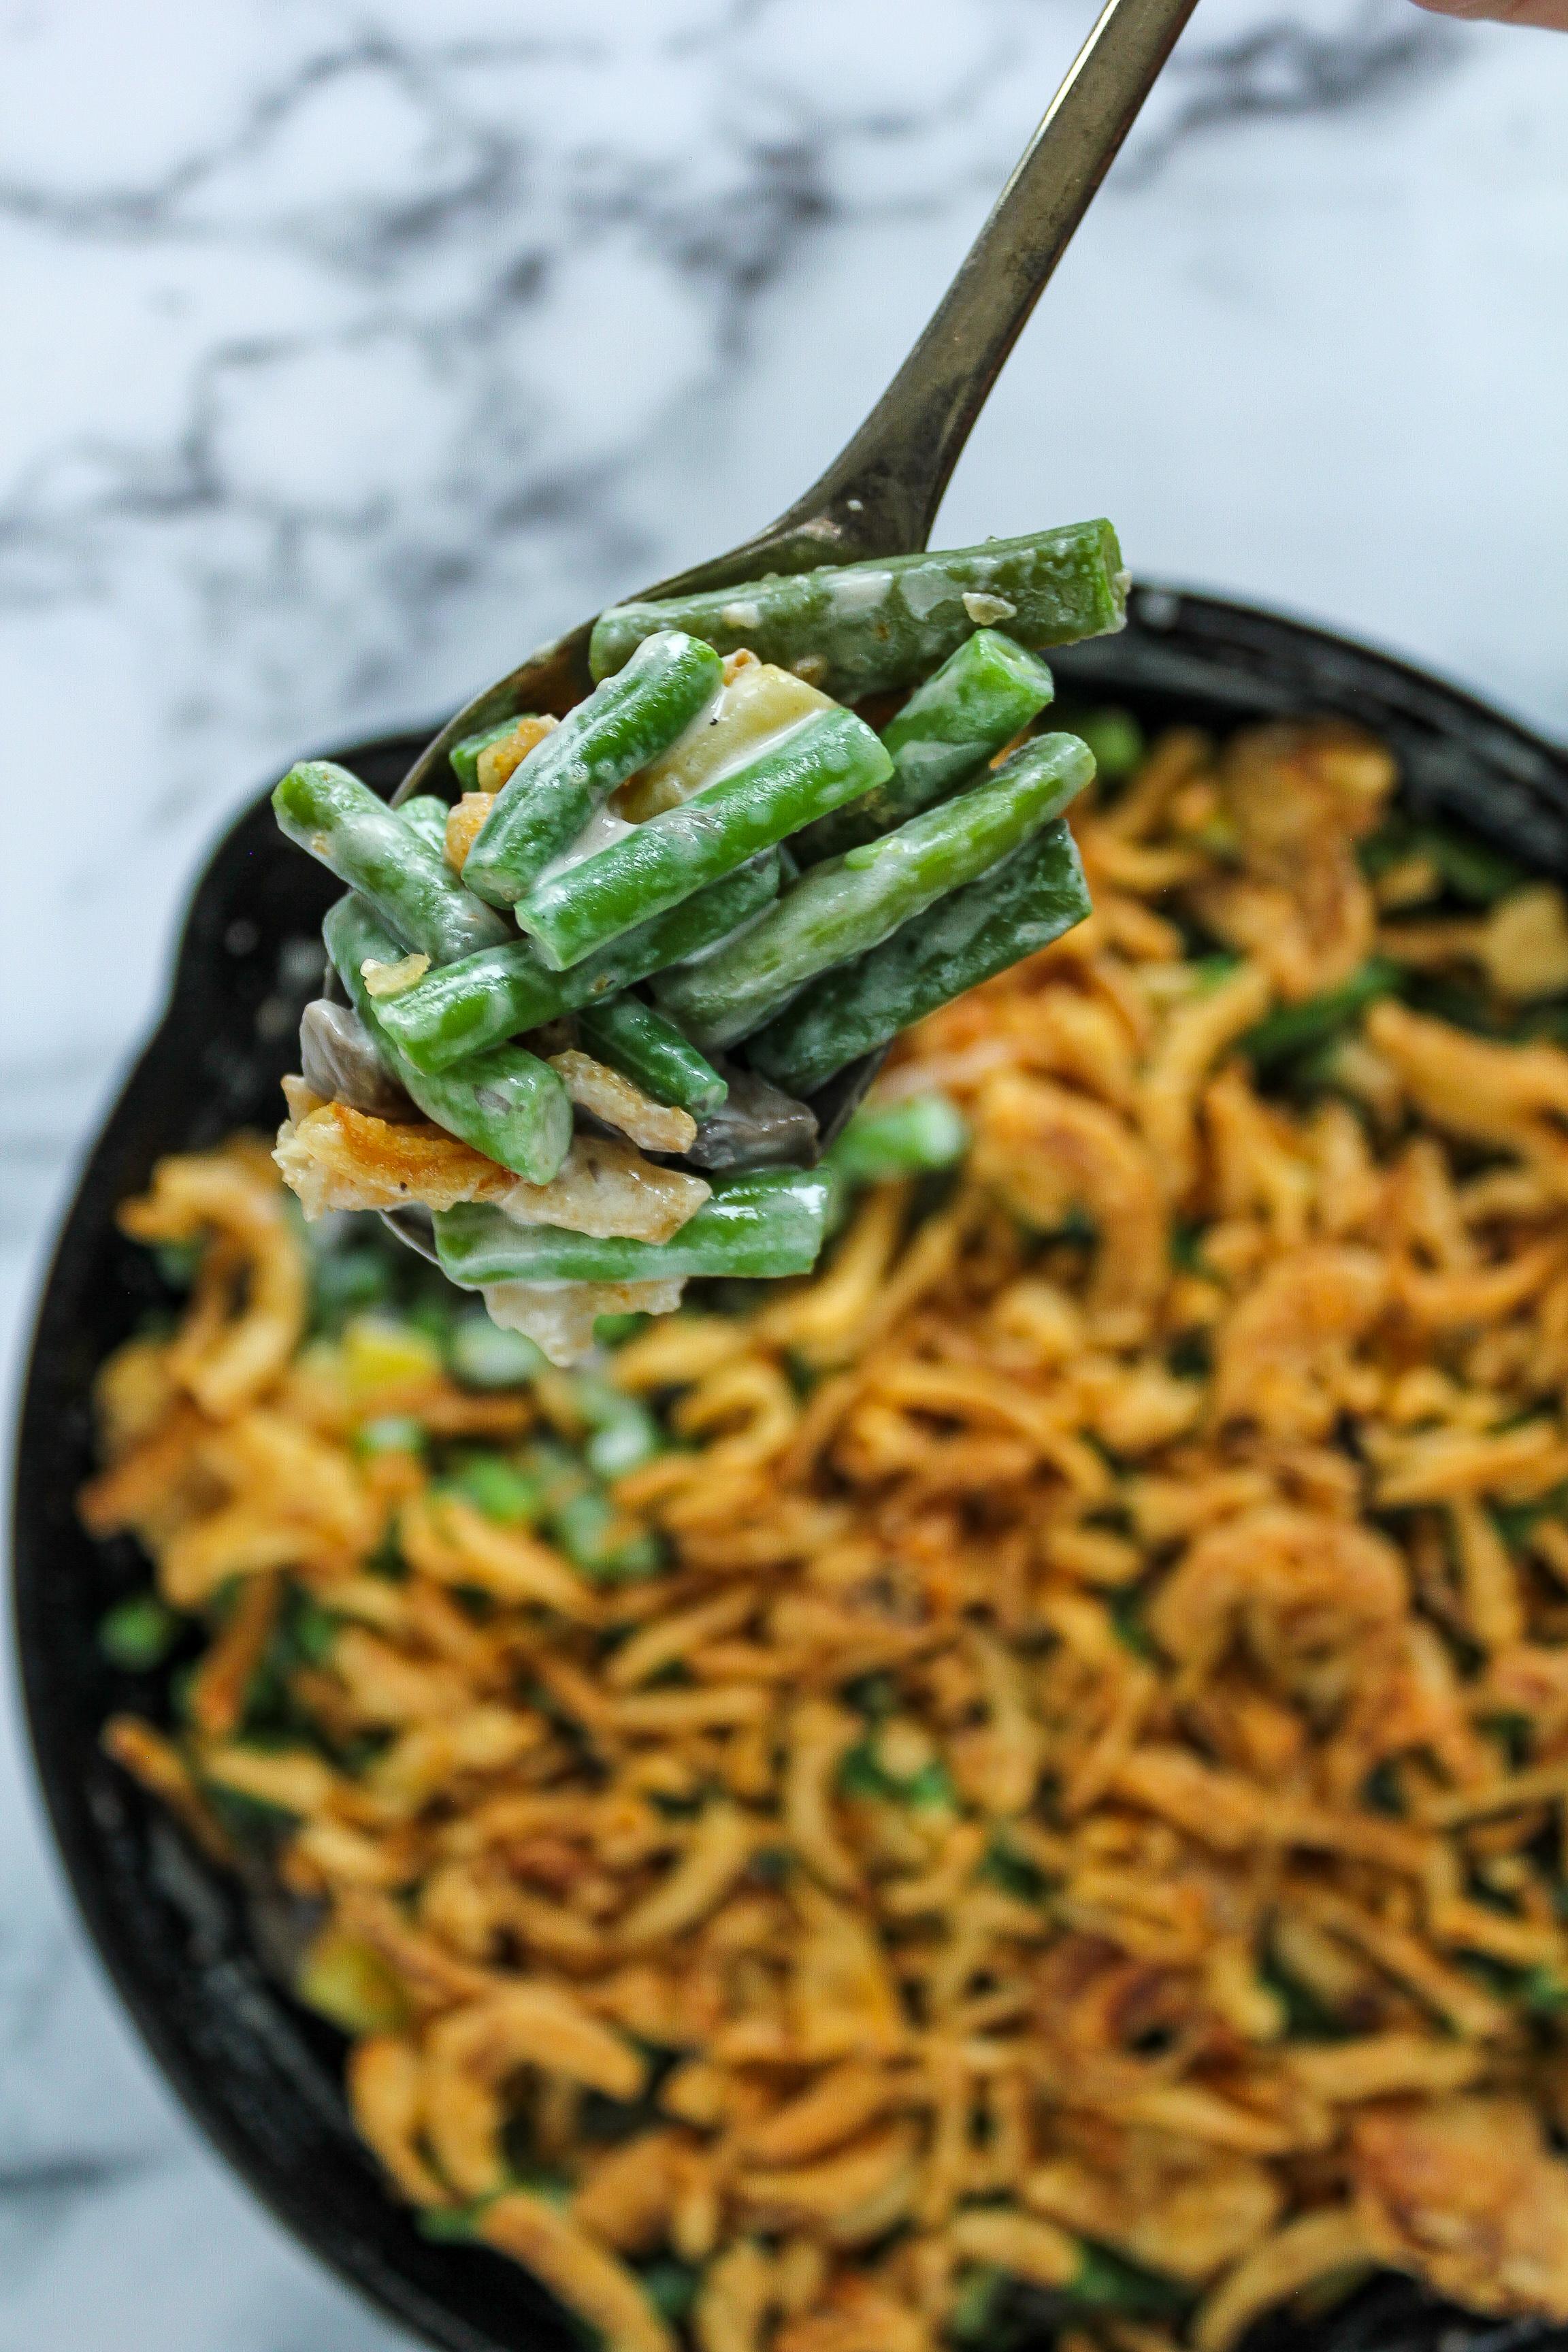 A spoon full of green bean casserole.